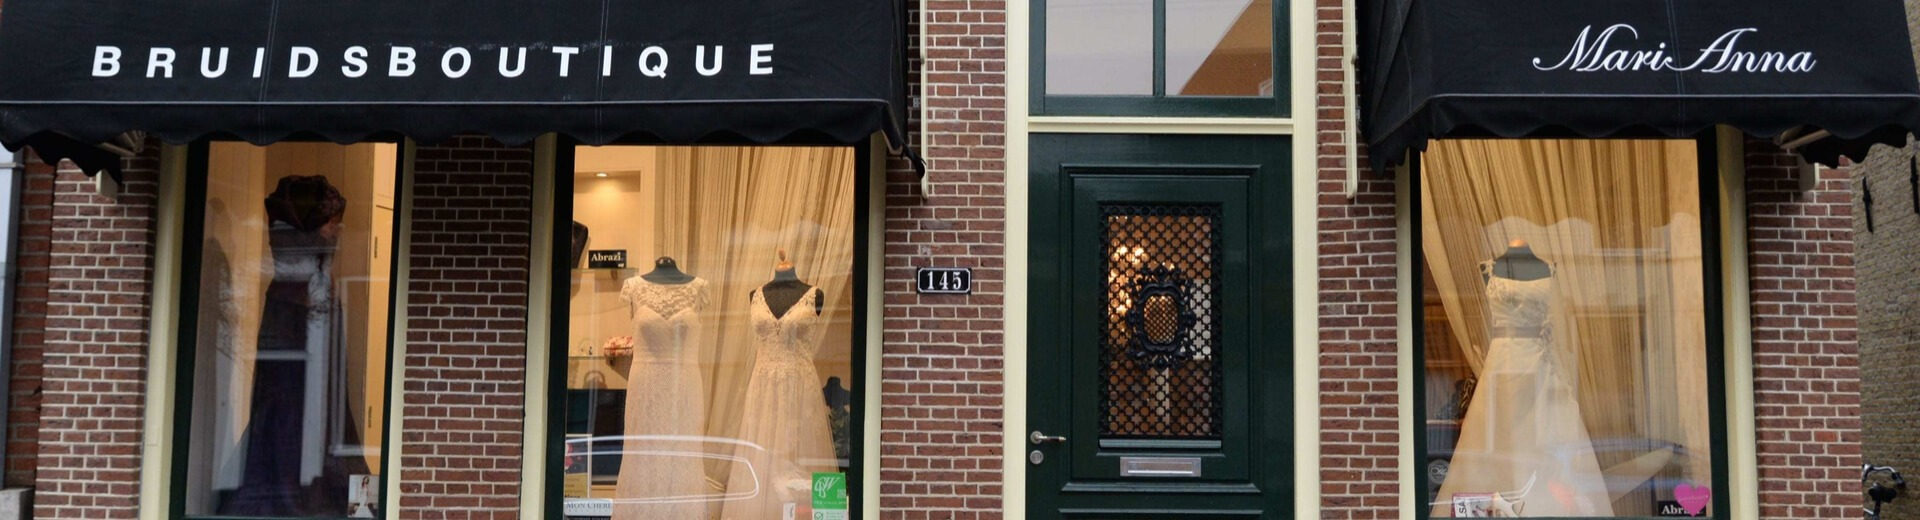 Onze bruidsmode winkel in Friesland